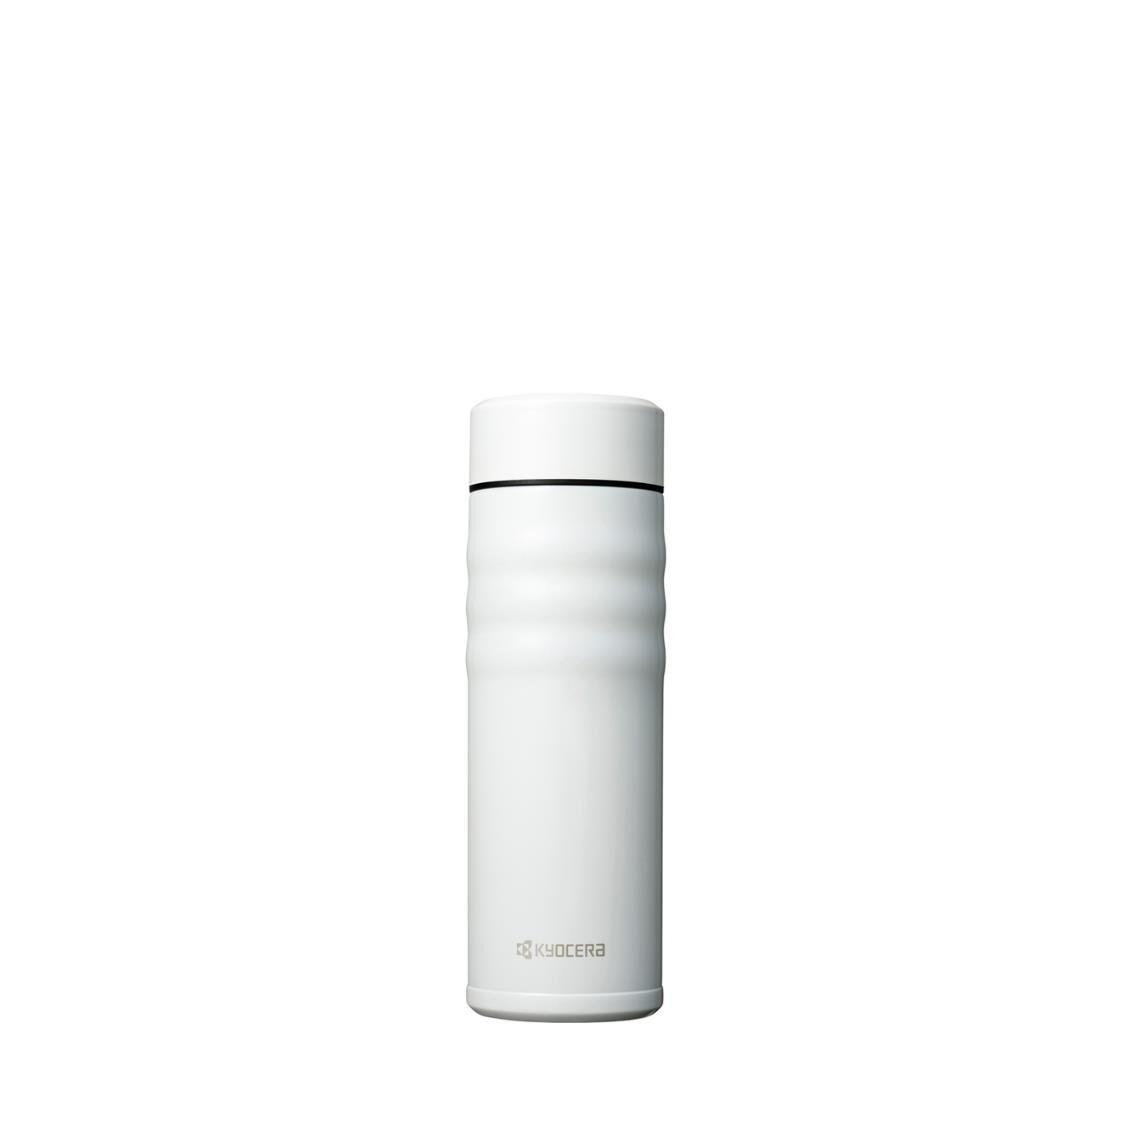 Kyocera 500ml Advanced Ceramic Coated Cerabird Mug White MB-17S WH